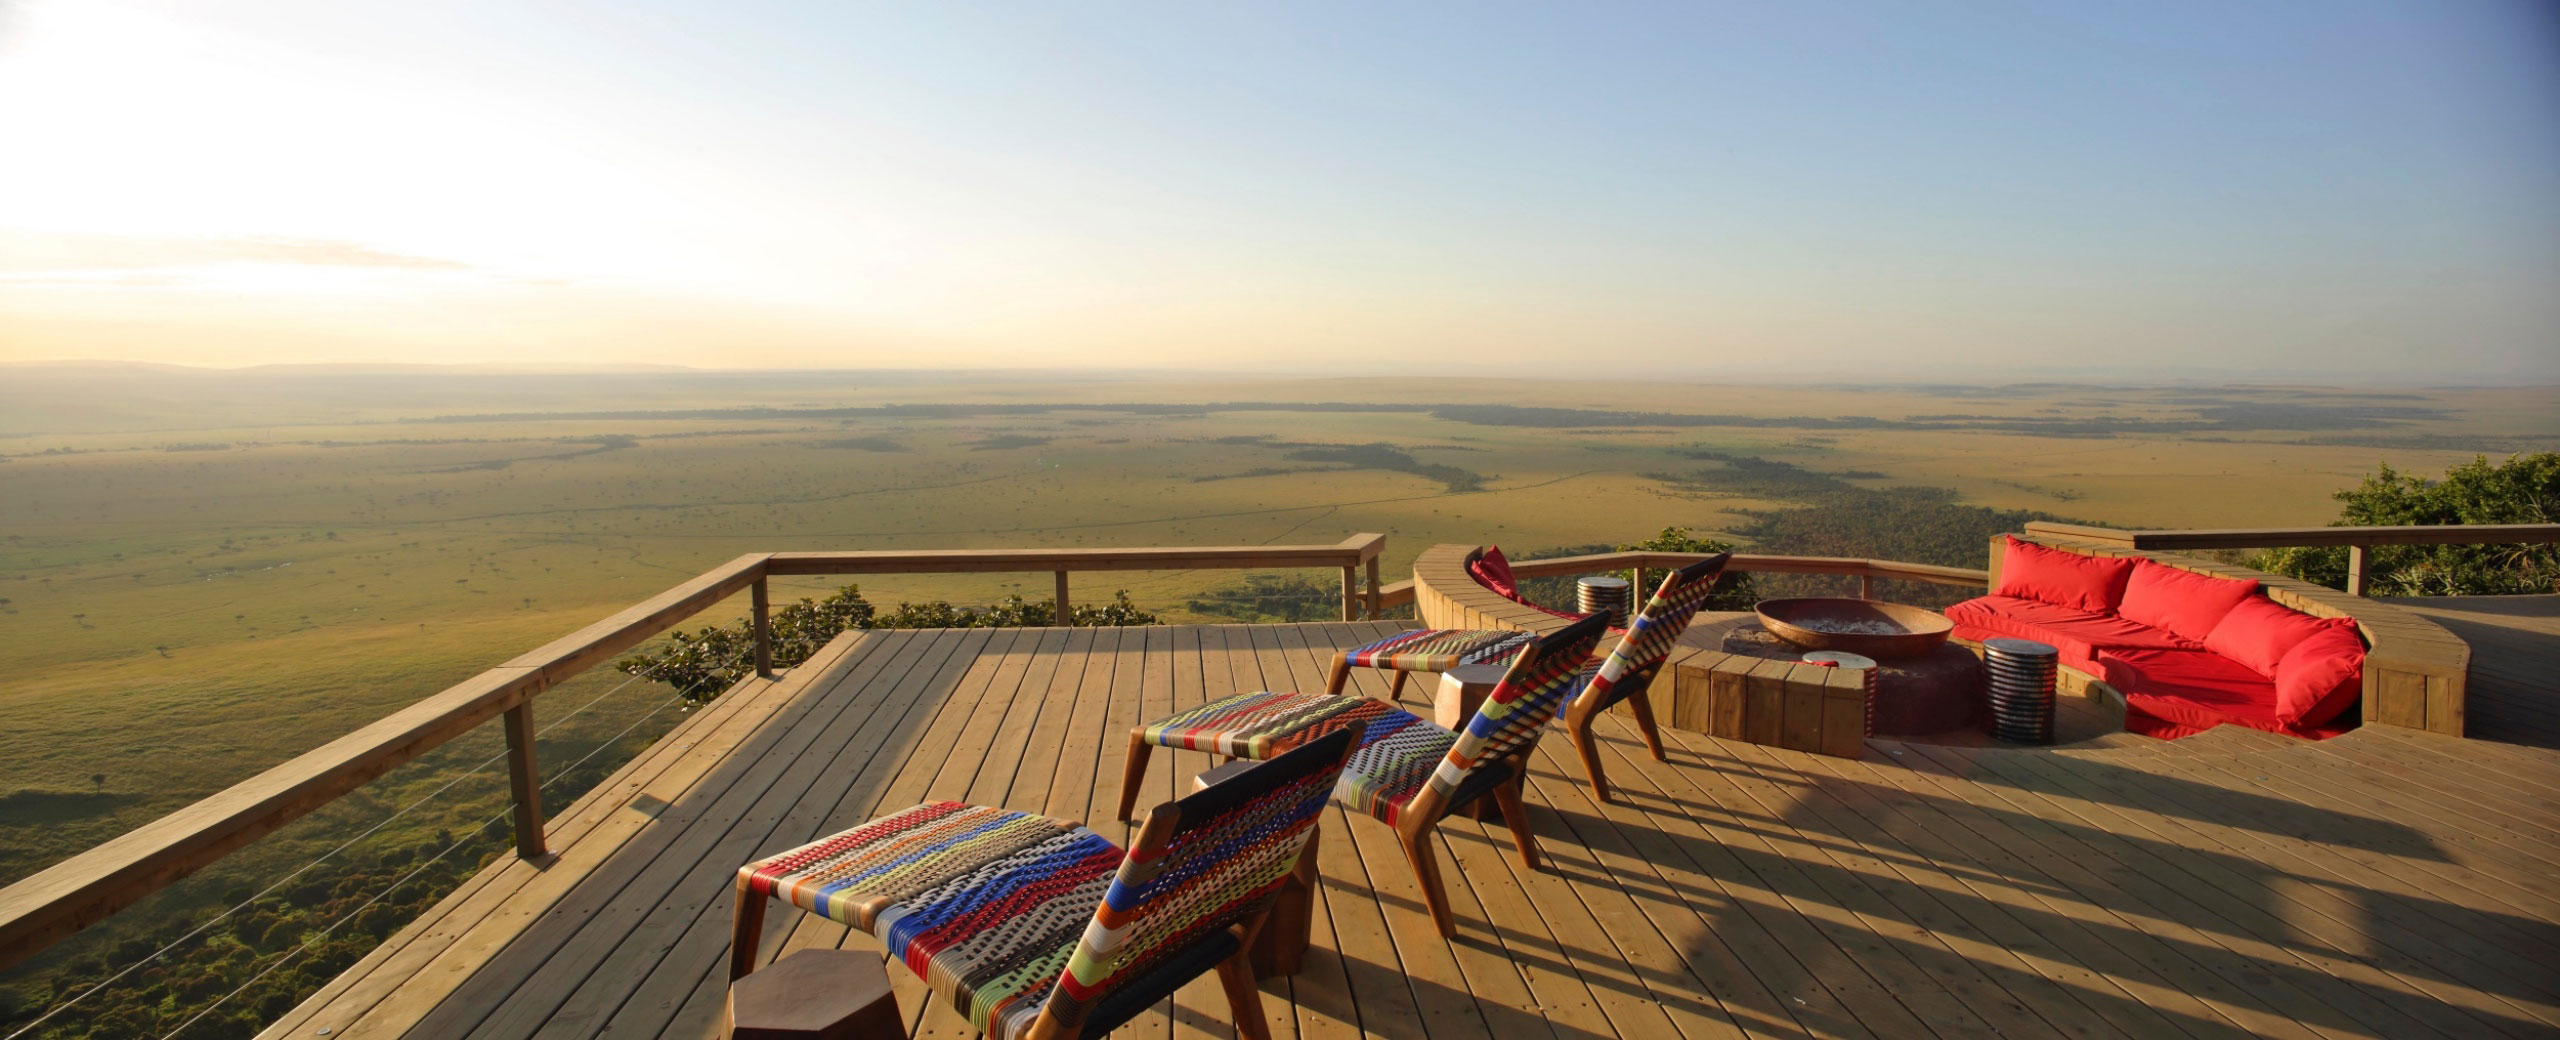 angama mara safari view kenya masai enkosi africa Campamento mejores Vistas África